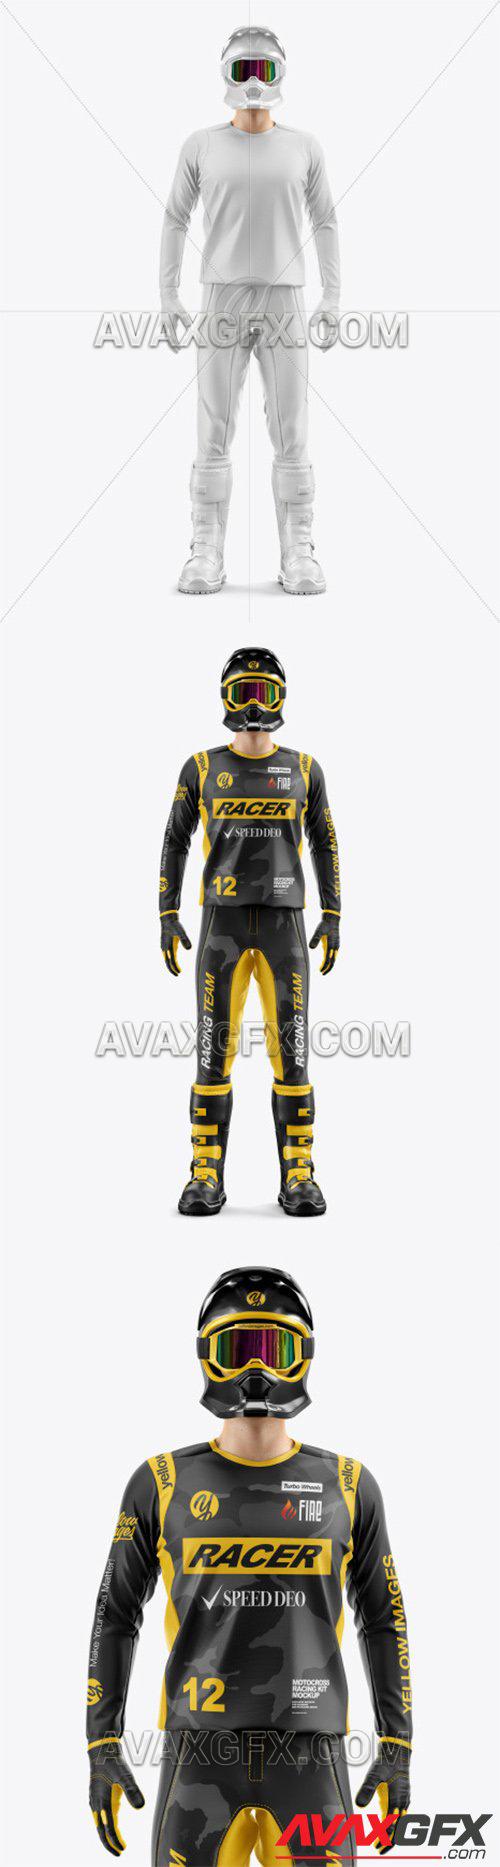 Download Motocross Racing Kit Mockup 56906 » AVAXGFX - All ...